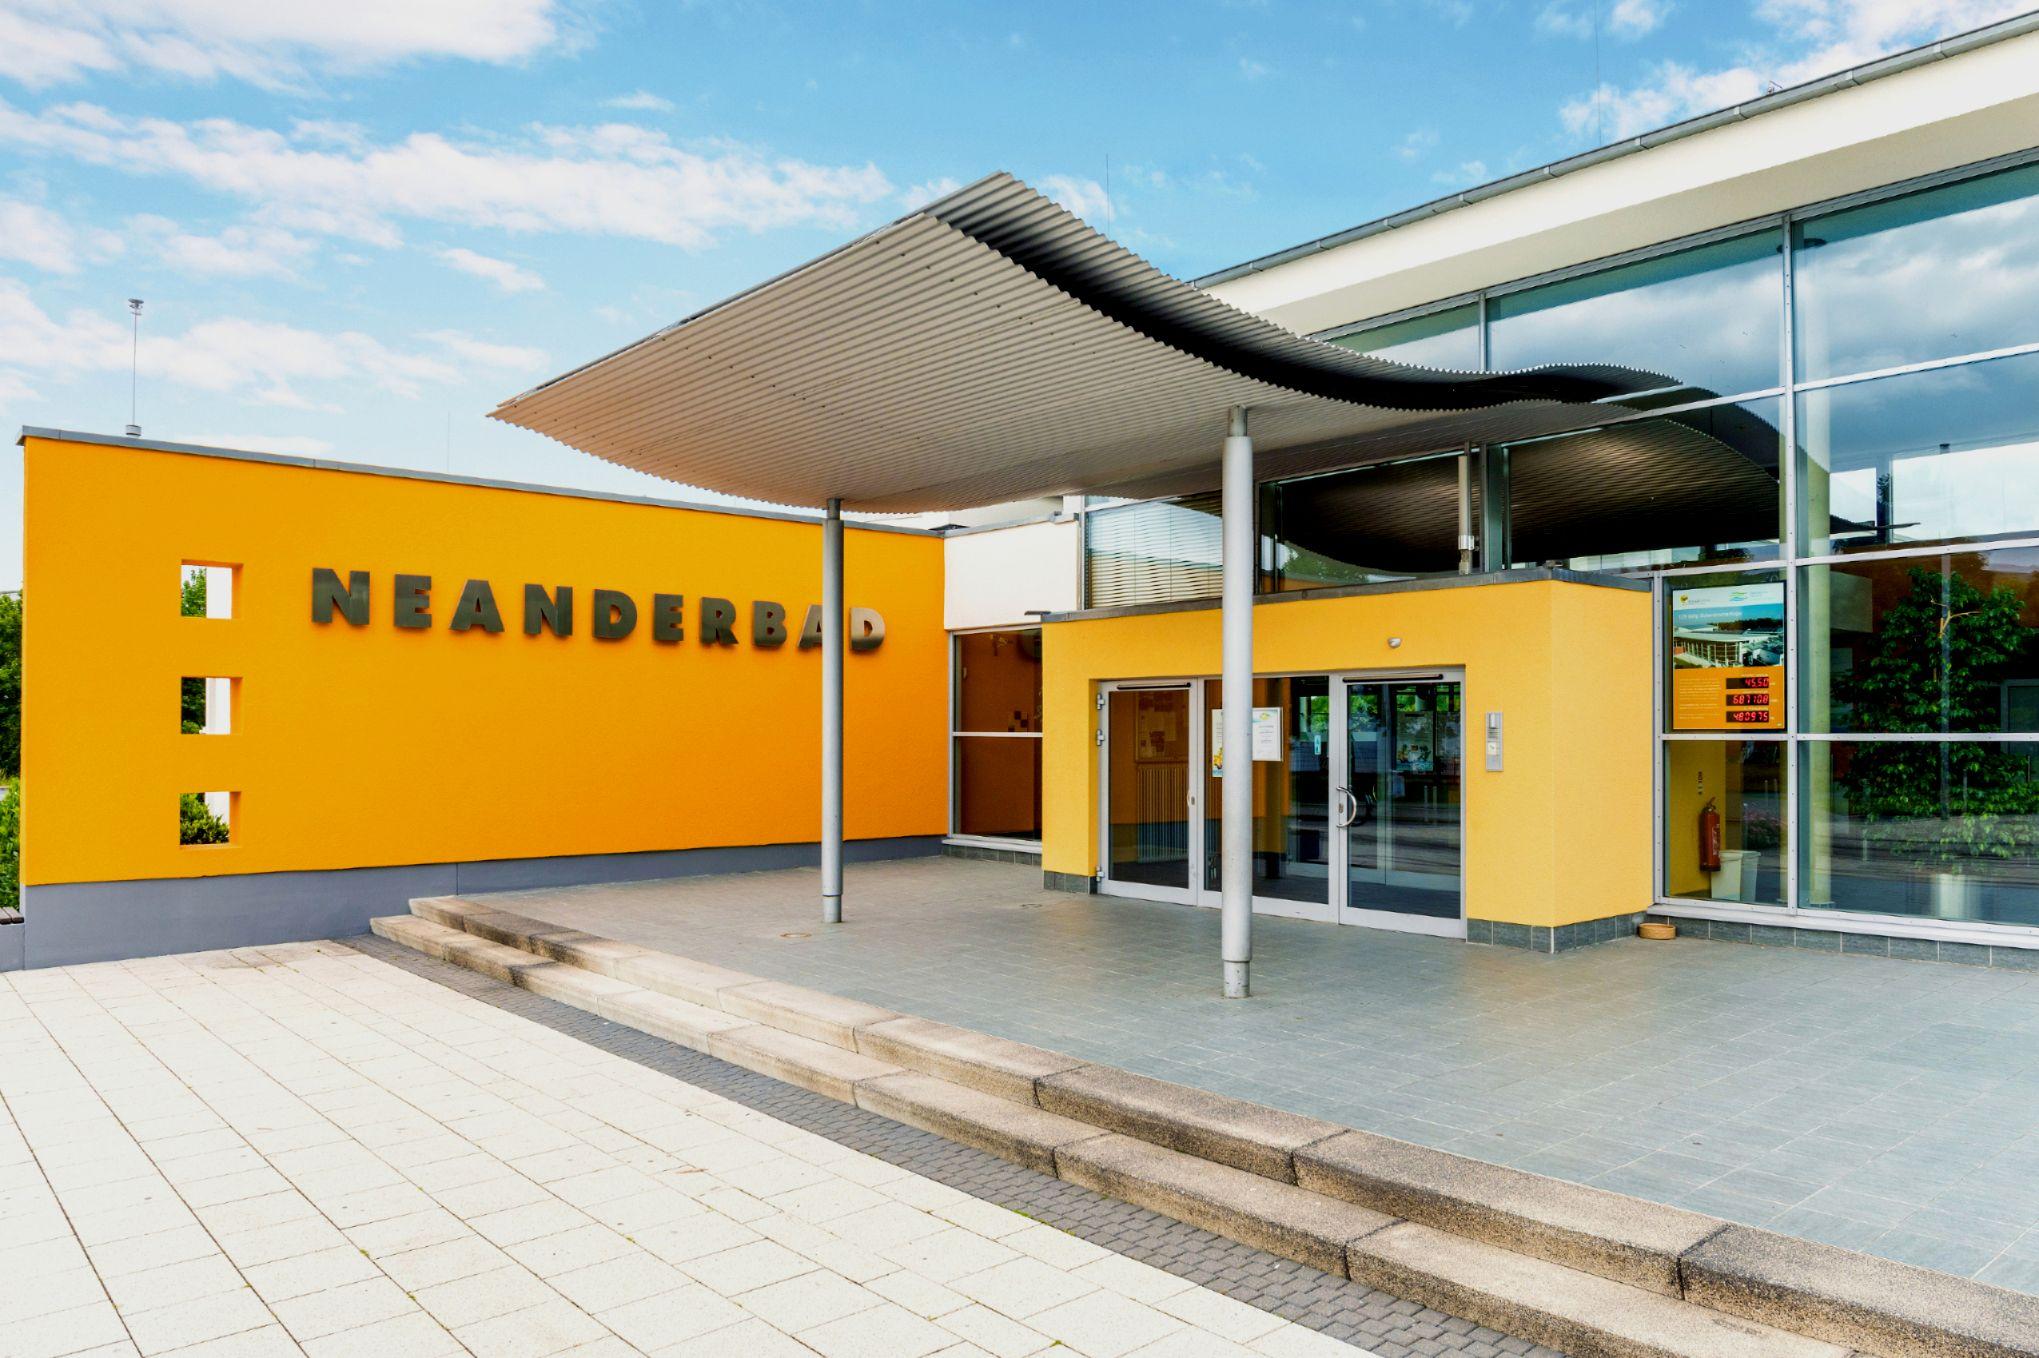 Neanderbad